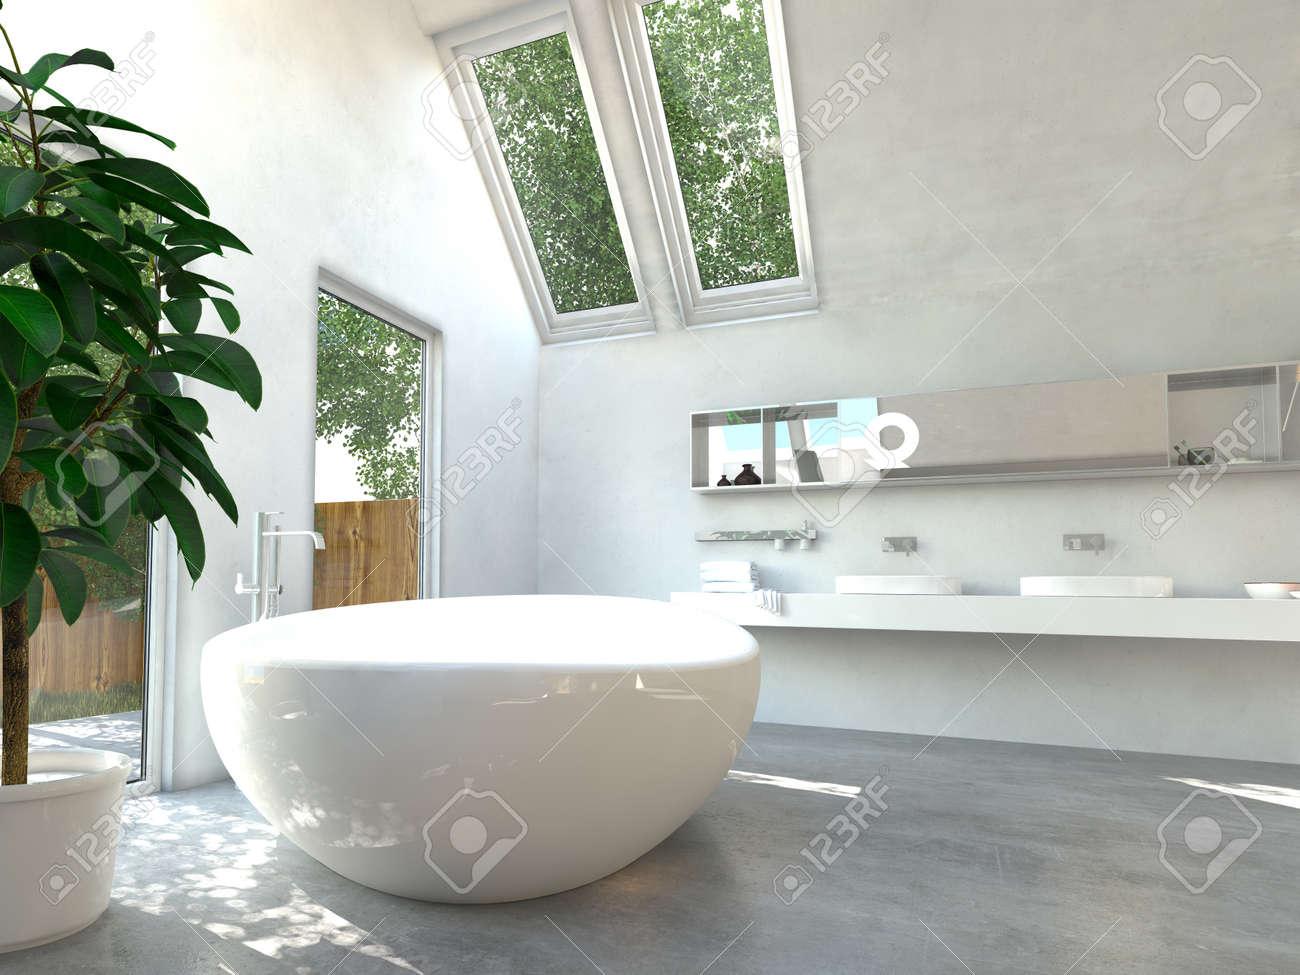 Vasca da bagno freestanding: vasca da bagno vendita rubinetti per ...